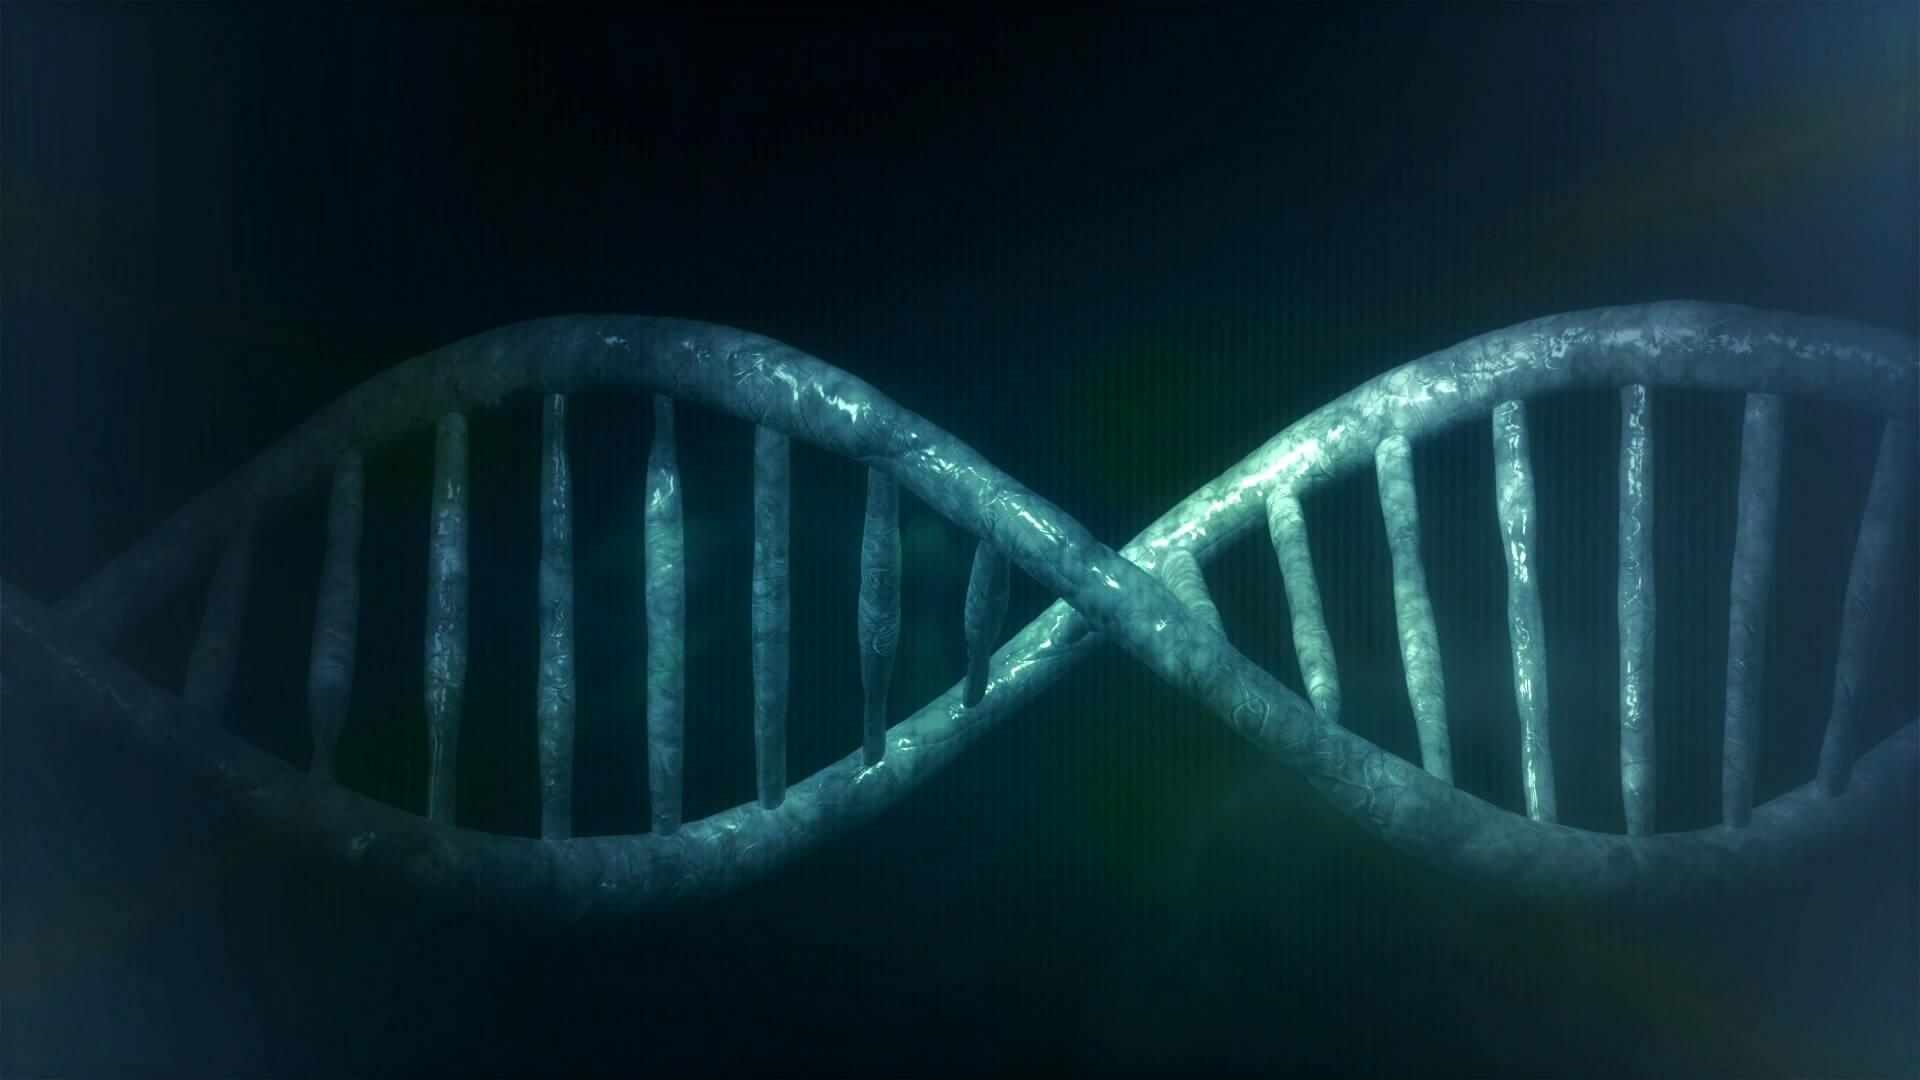 Cells, DNA, Chromosomes & Genes